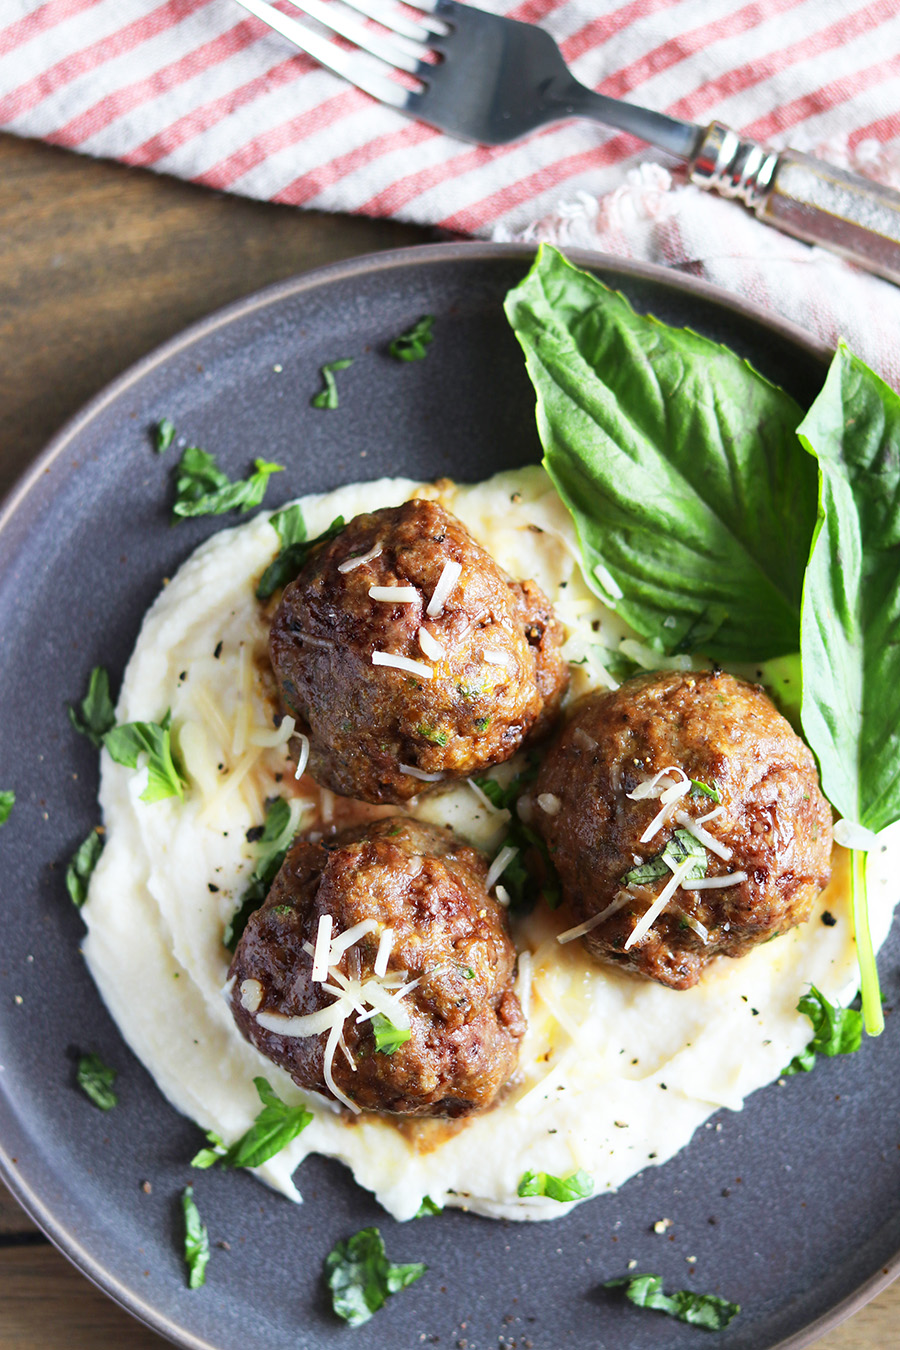 Paleo Savory Meatballs